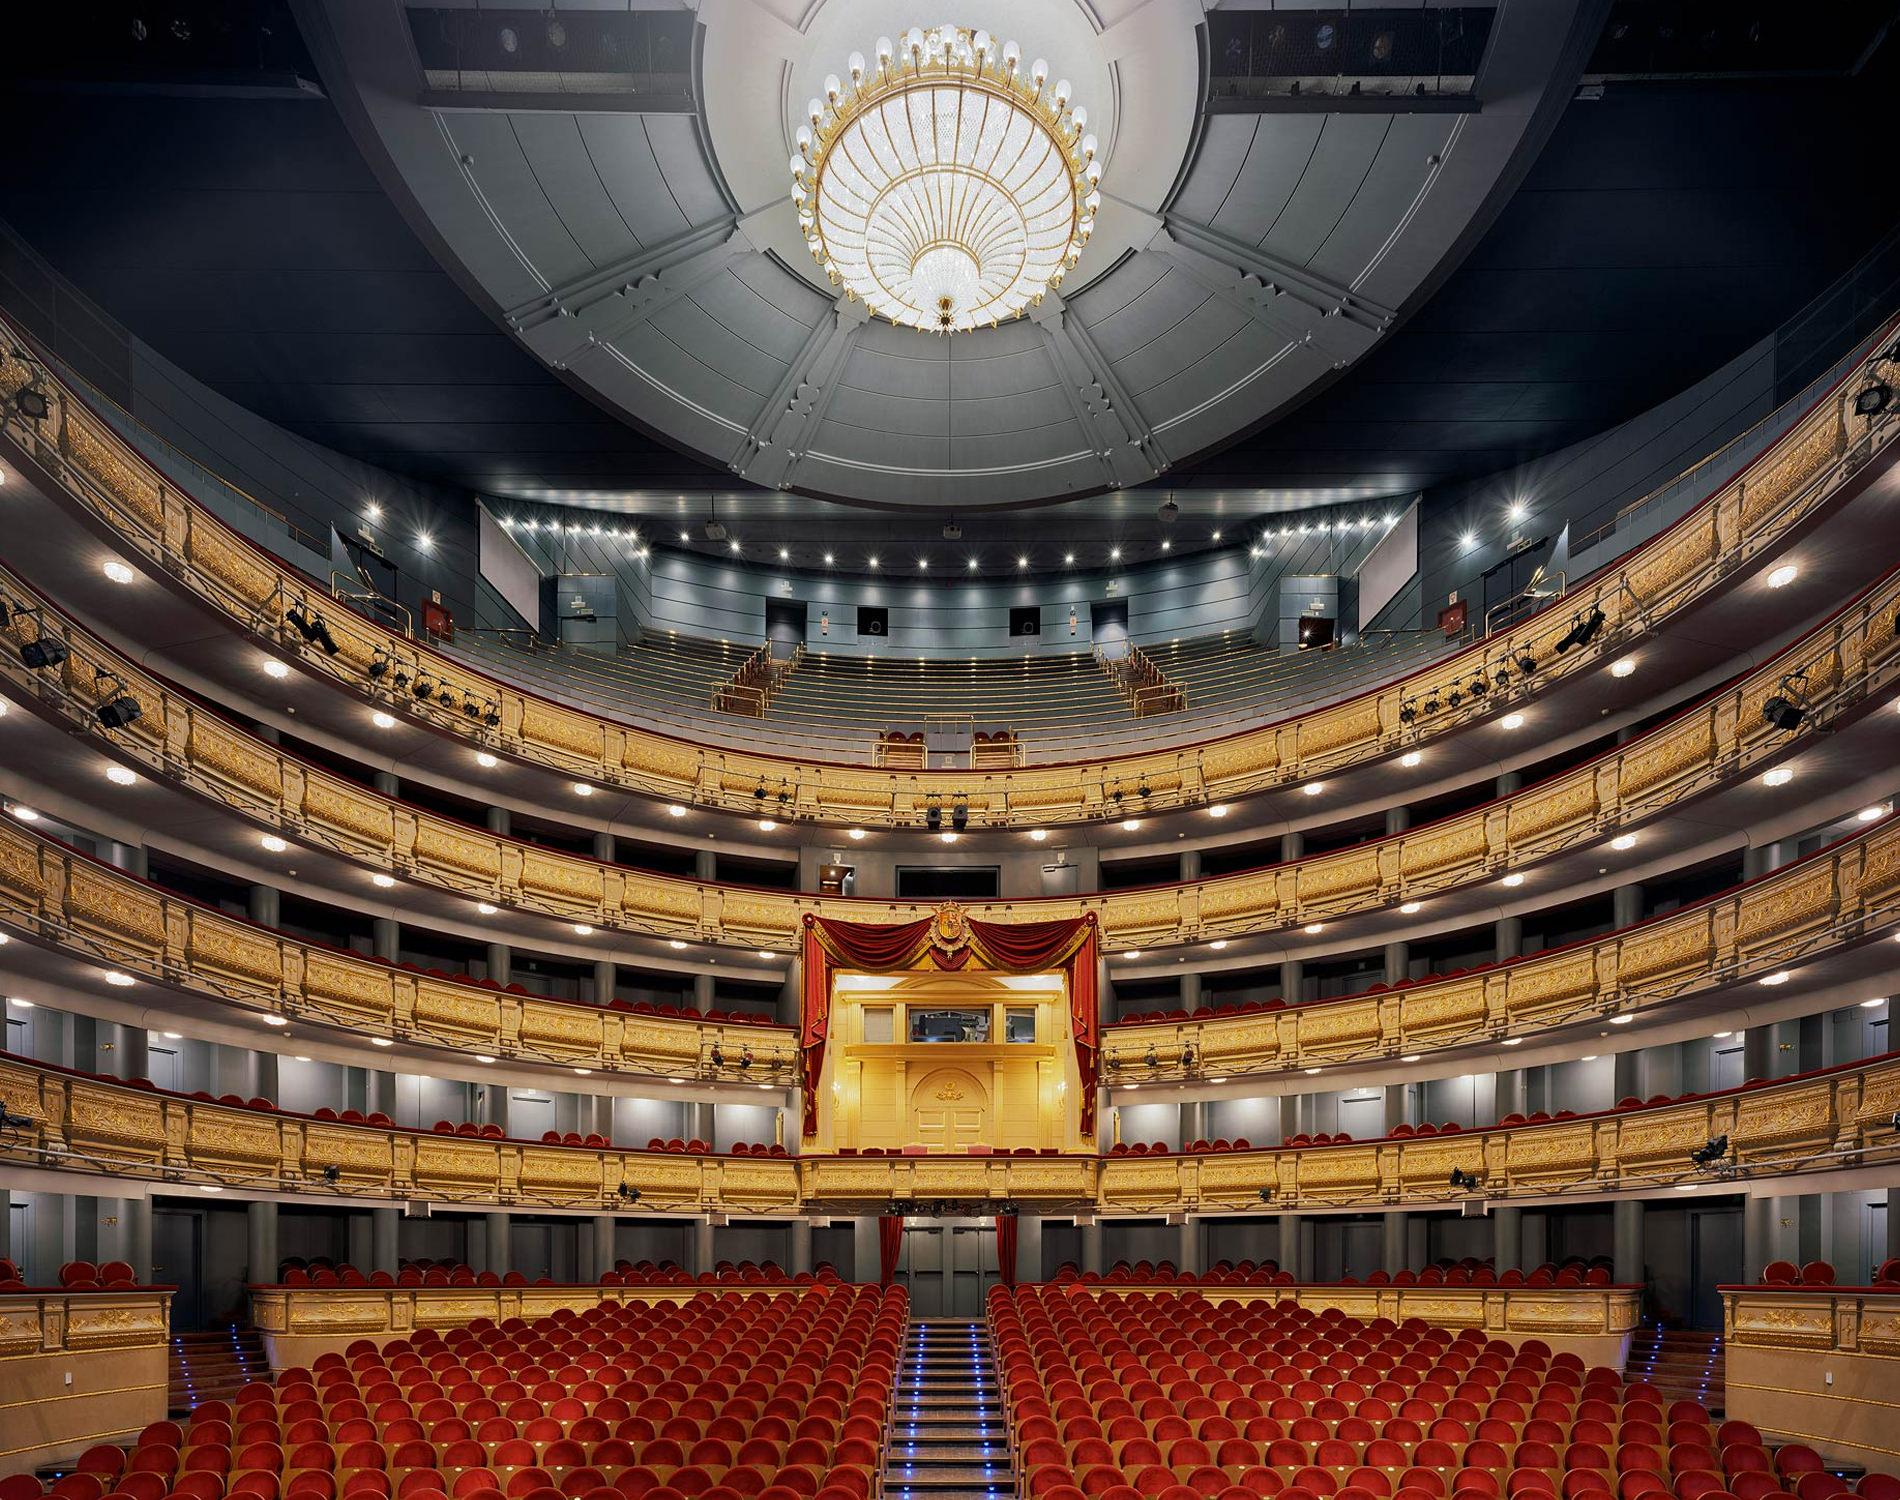 David Leventi Serie Photographie Opera Teatro Real Madrid Espagne 2009